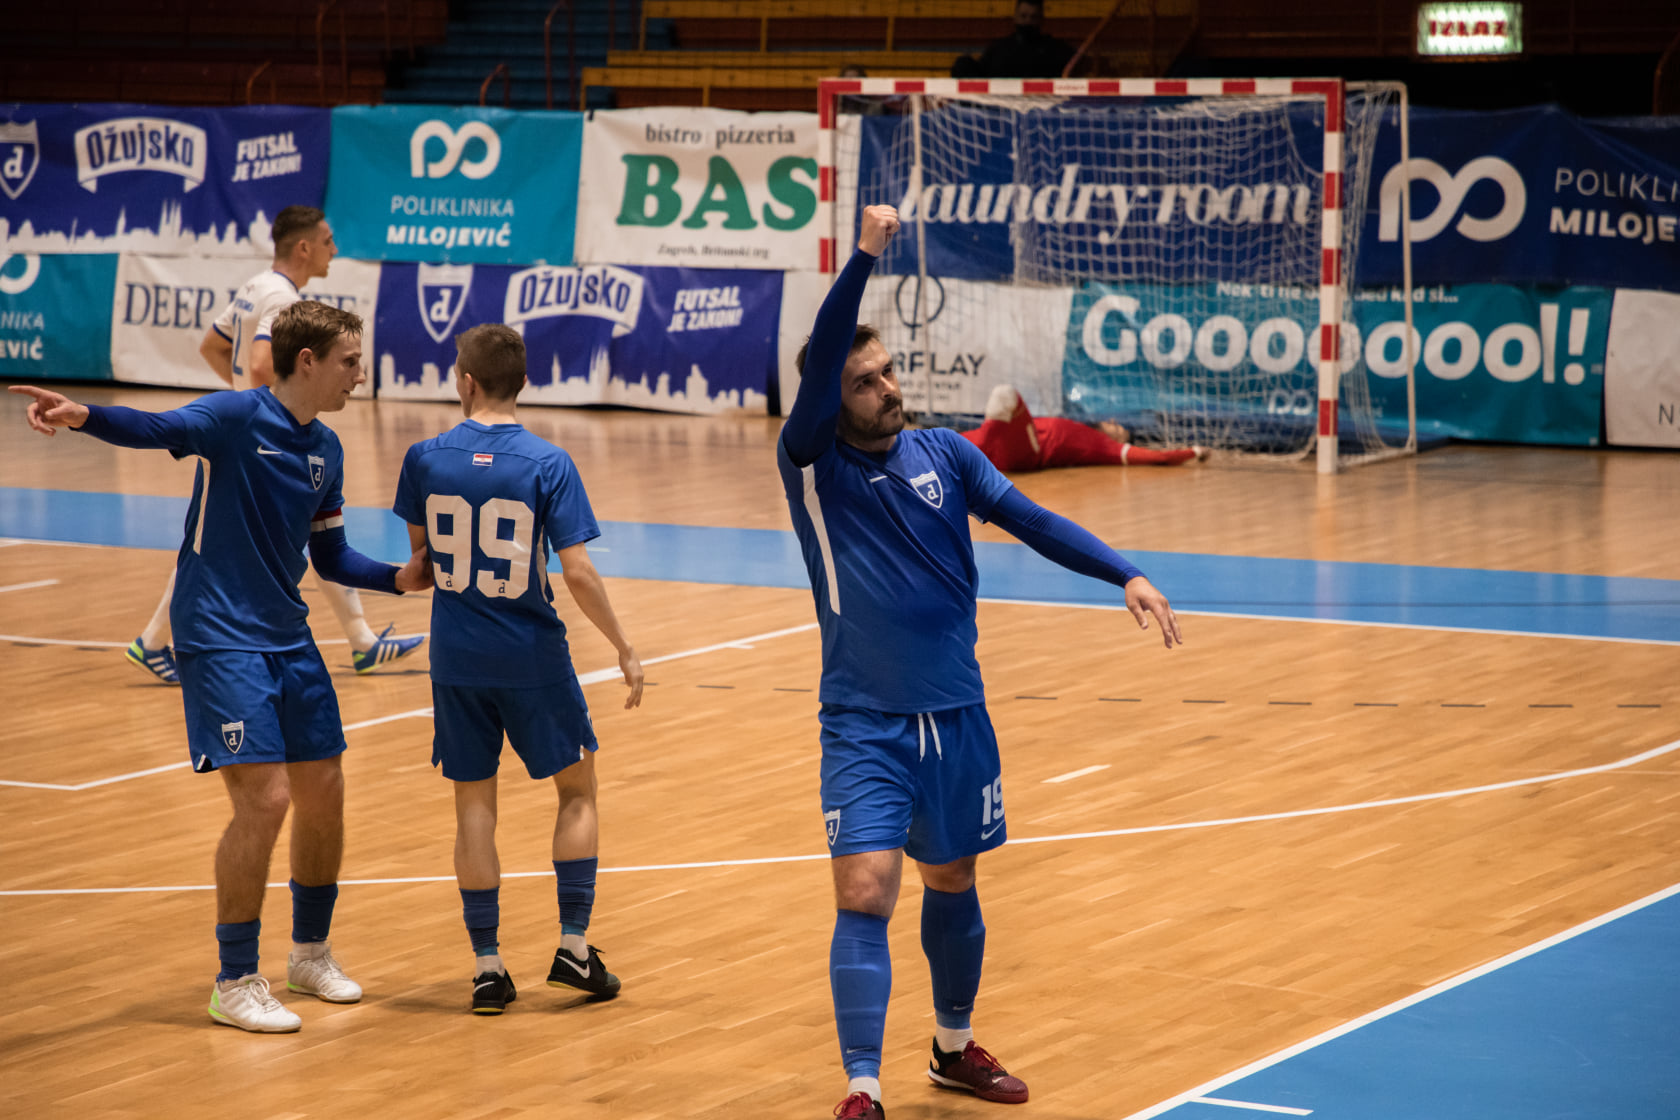 Igrač utakmice protiv Uspinjače - Grbeša